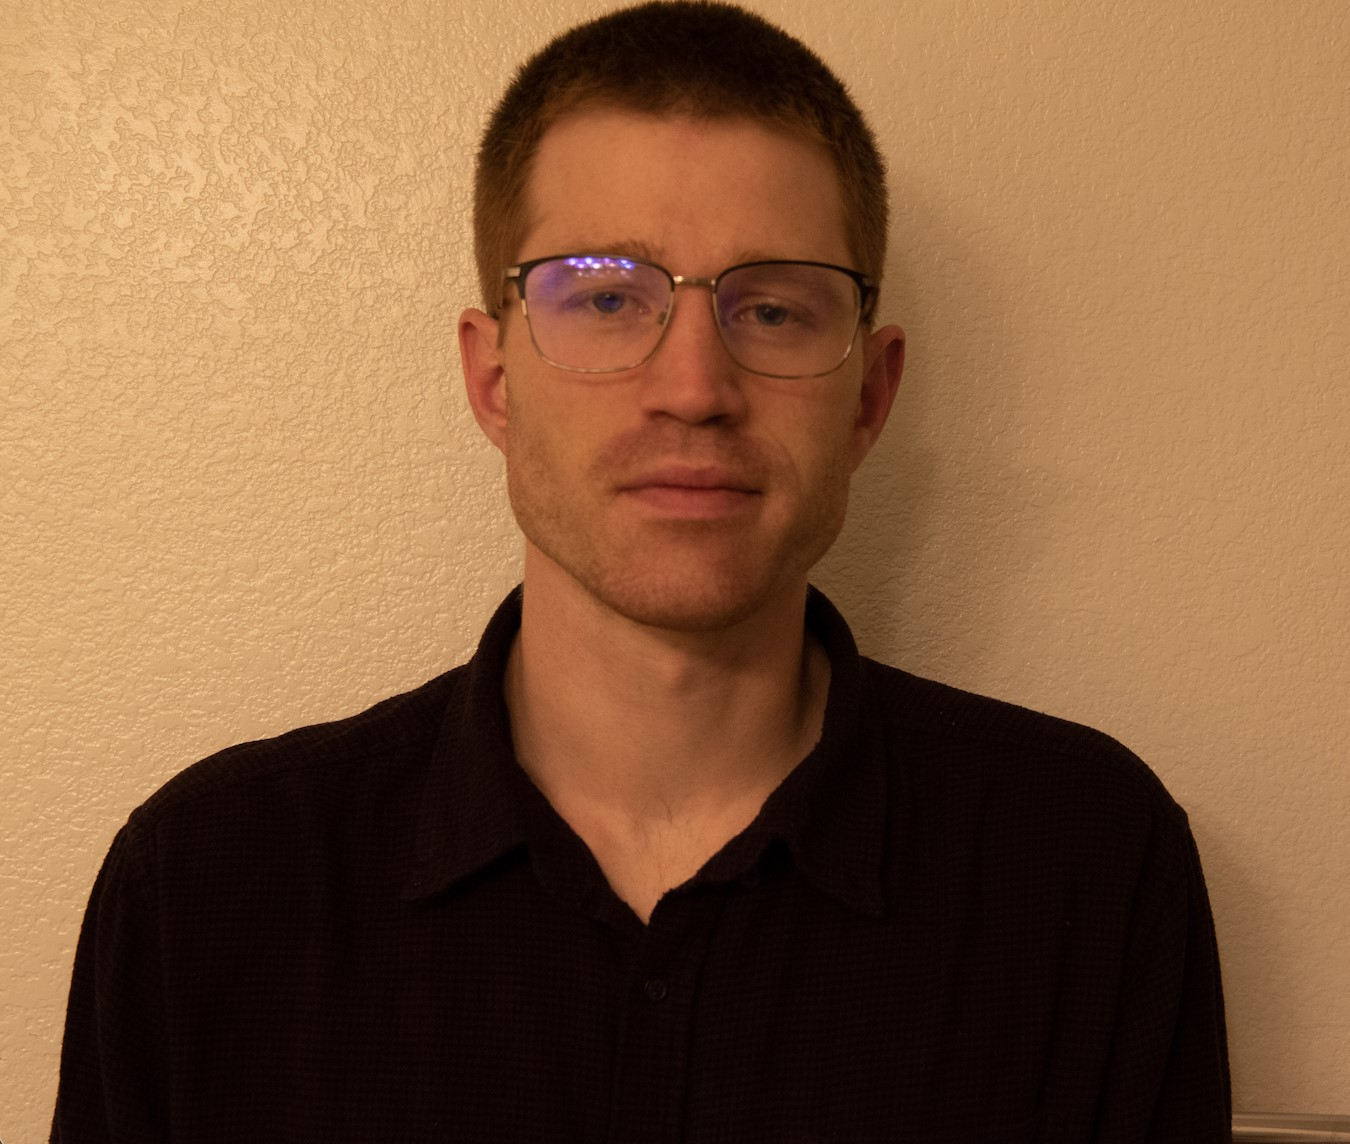 Joshua Bunzel